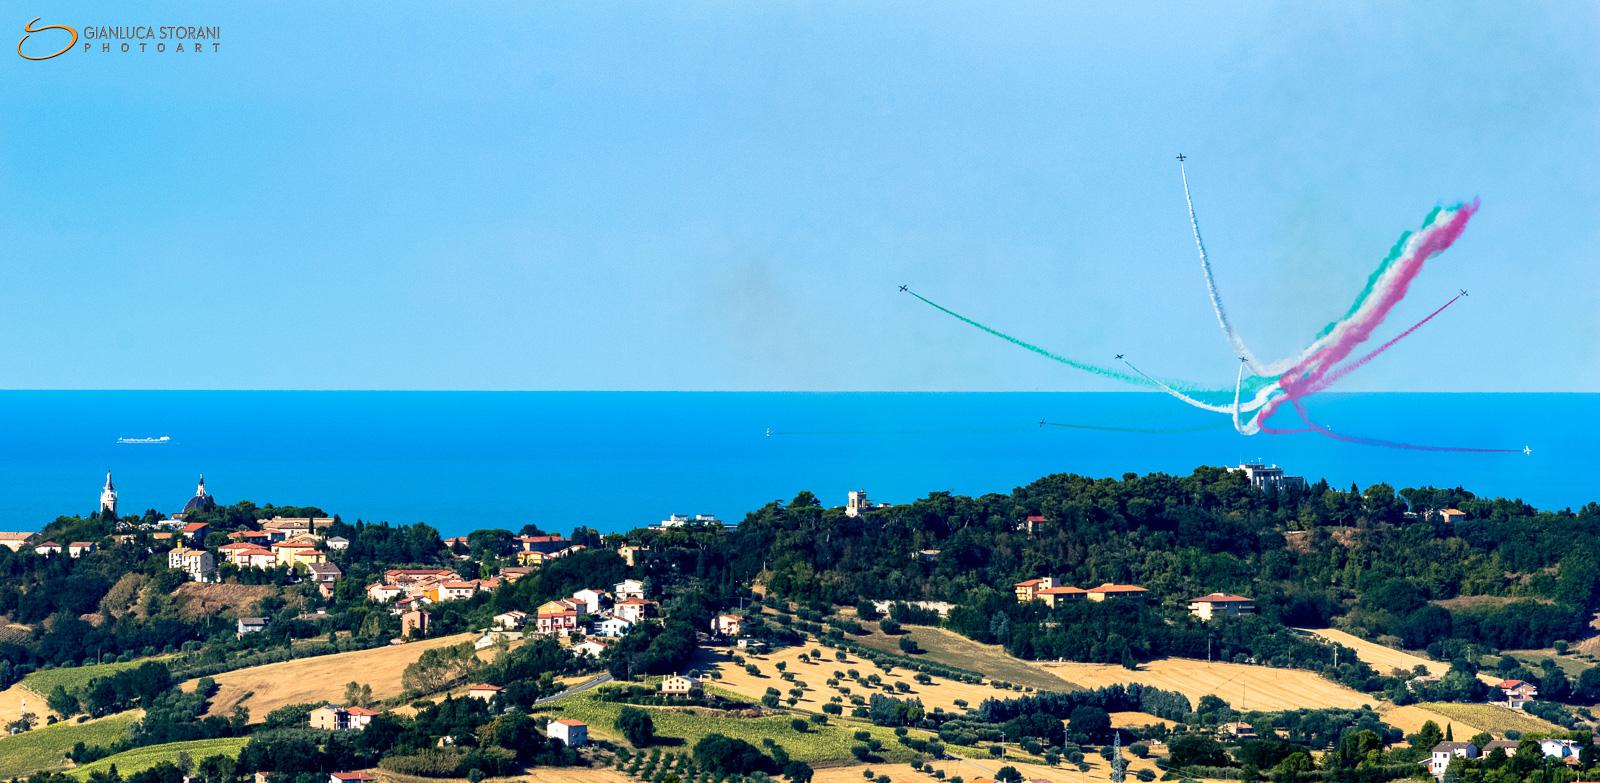 Acrobazie - Porto Recanati Air Show 2017 (ID: 4-0907)